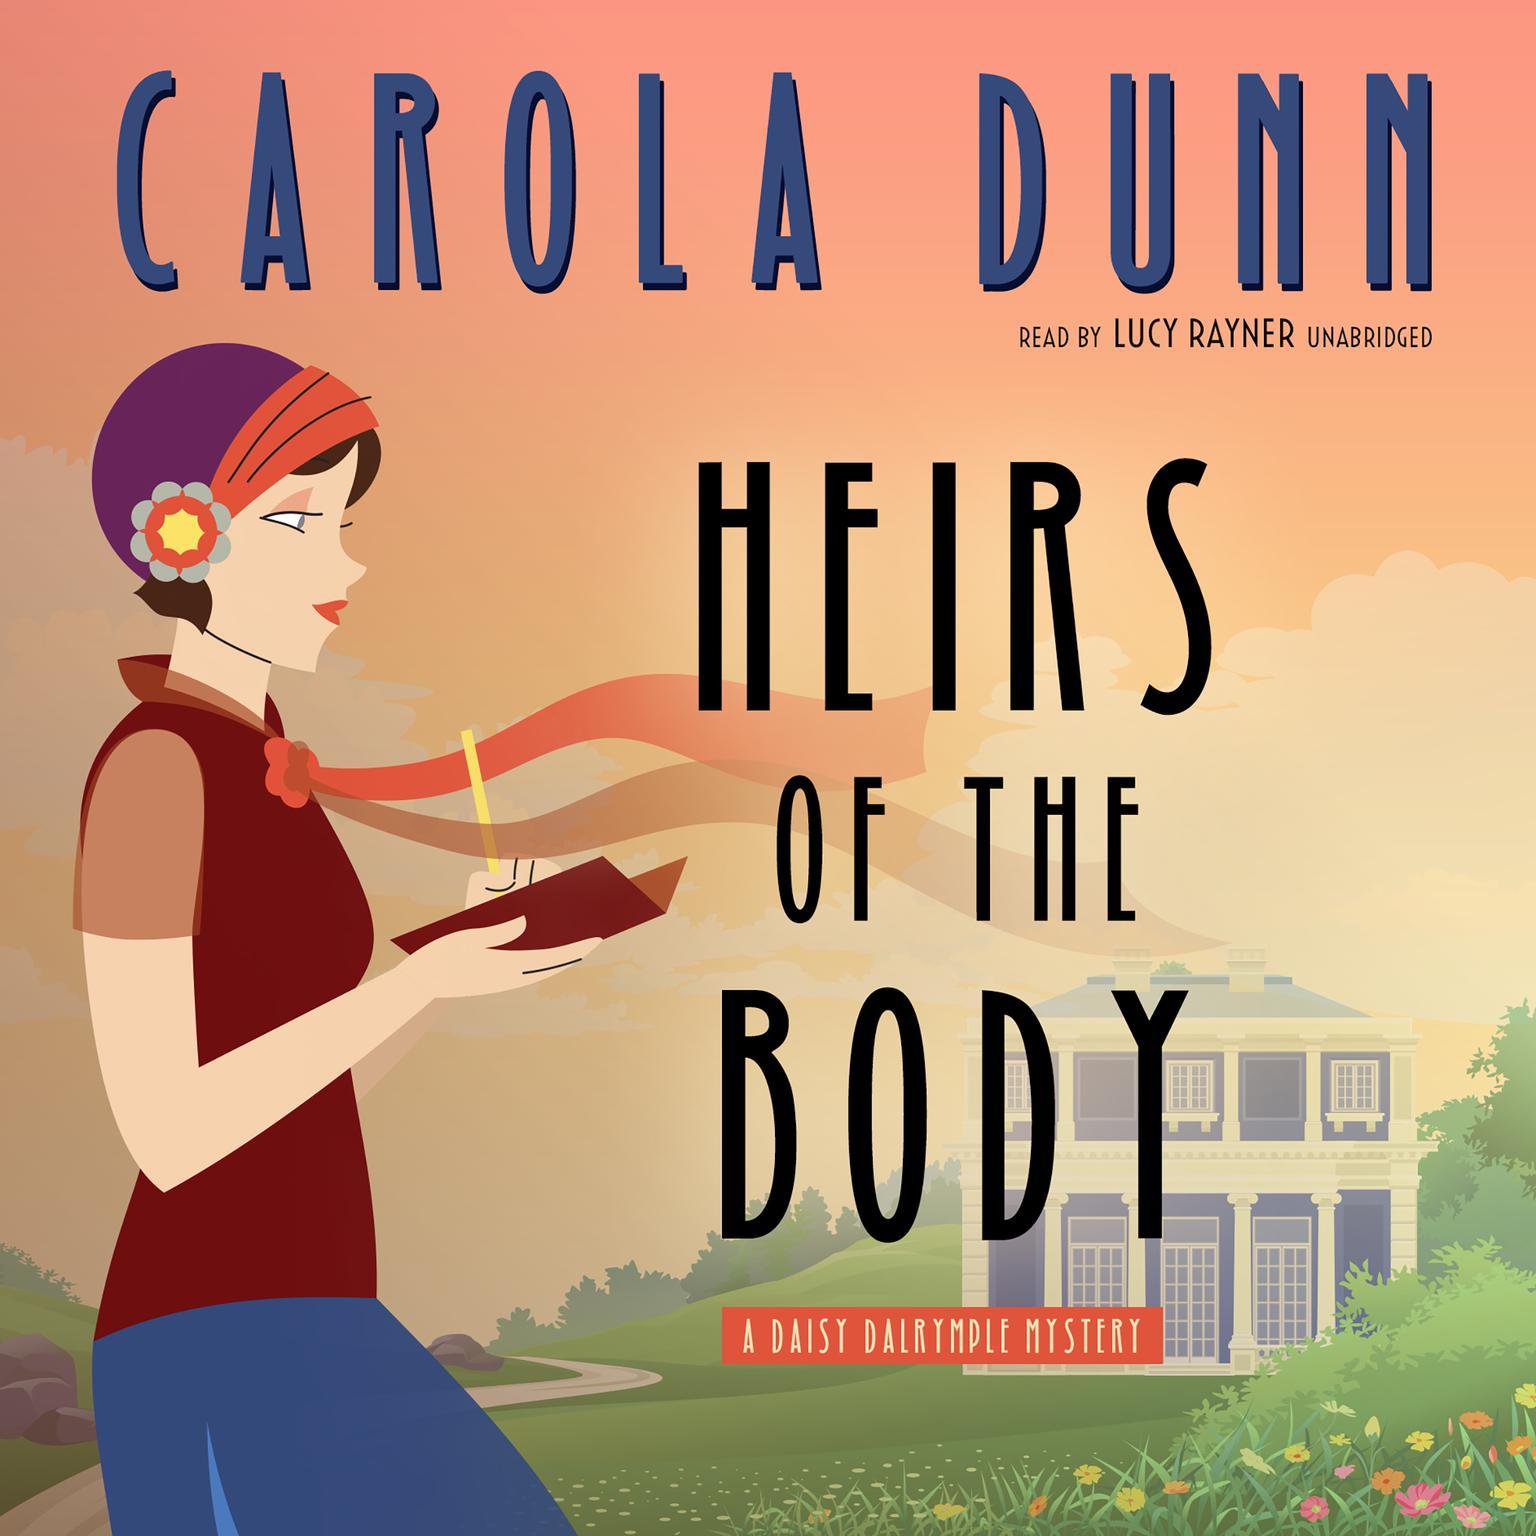 Heirs of the Body: A Daisy Dalrymple Mystery Audiobook, by Carola Dunn